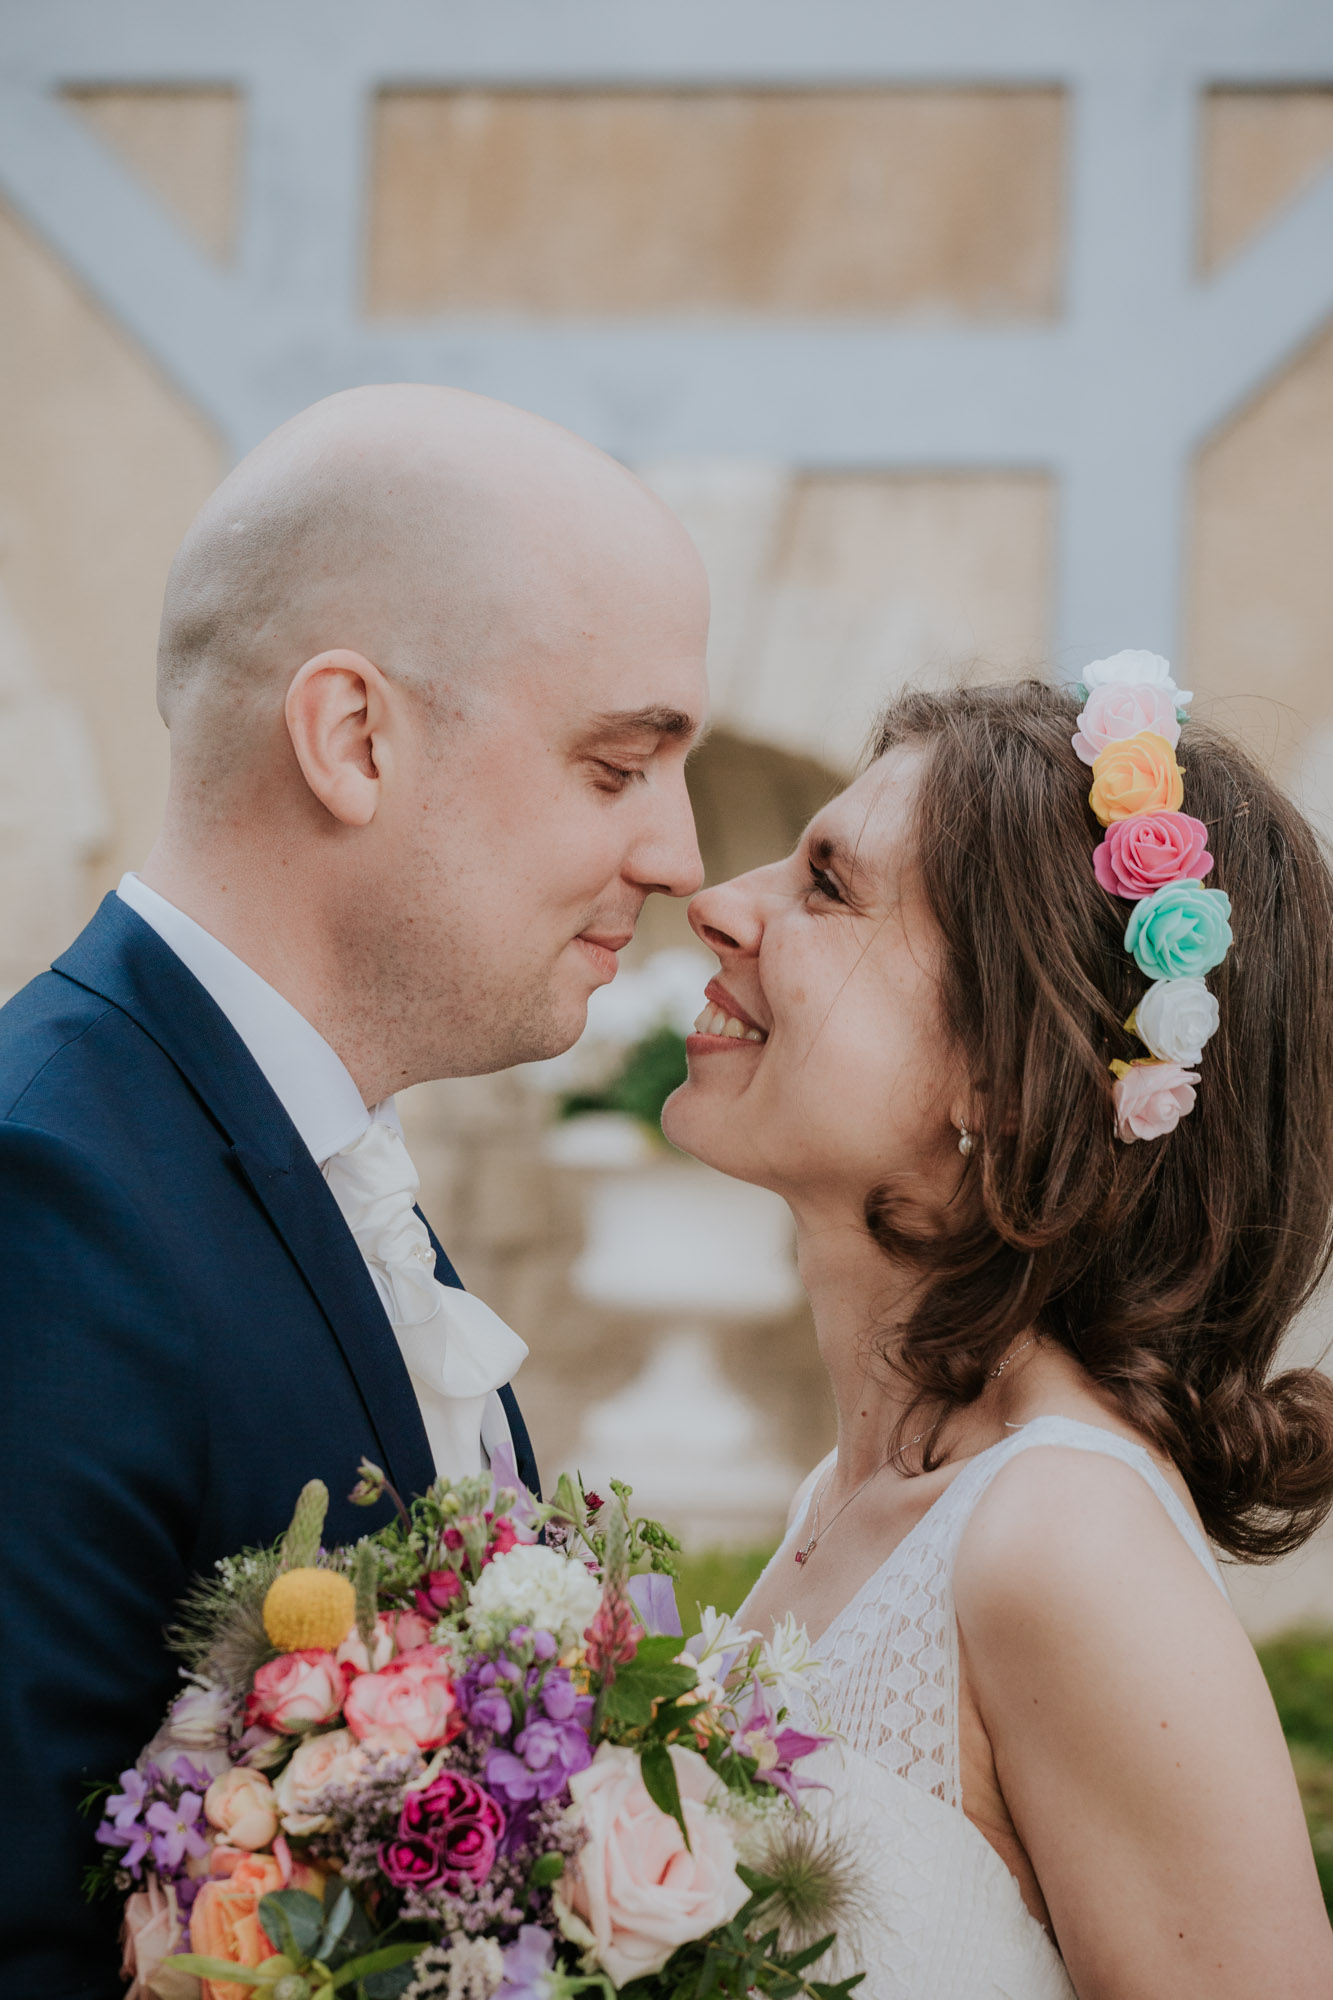 md-elsaetyann-18-5-19-couple-14